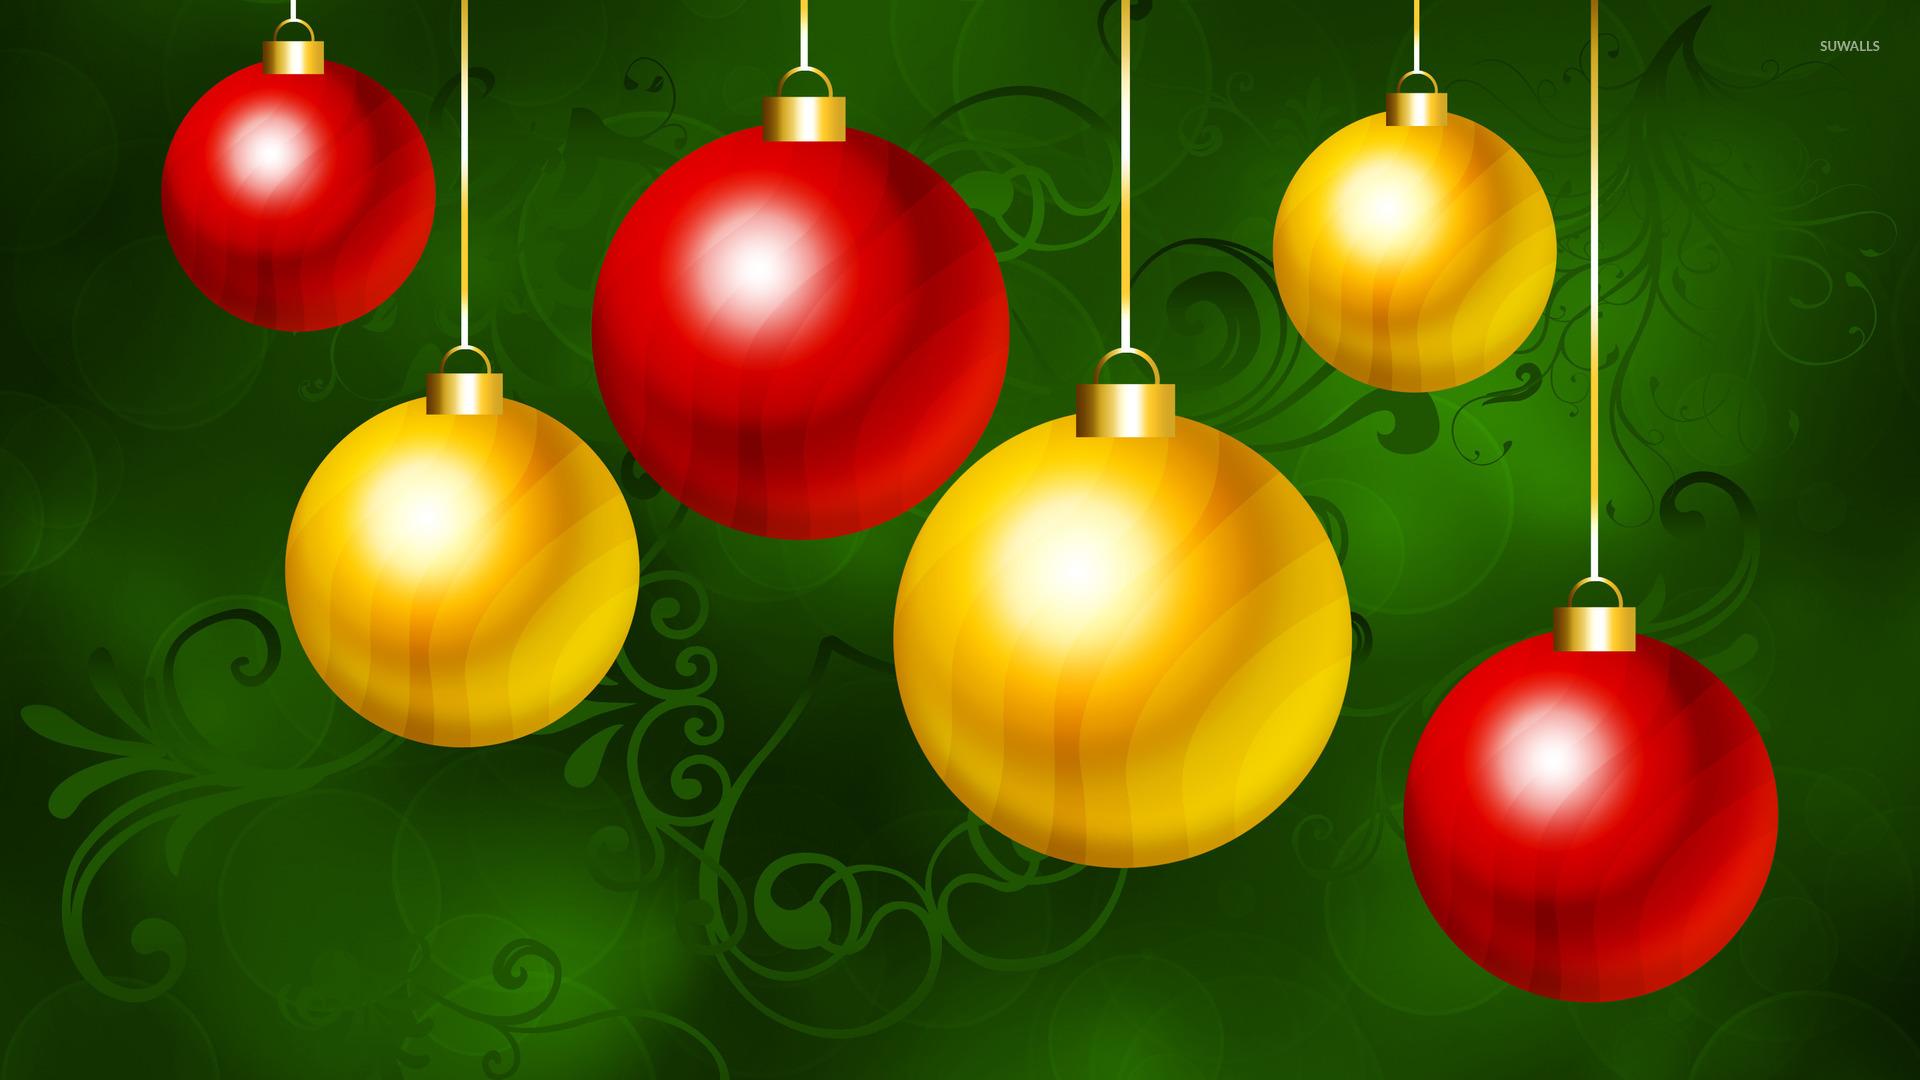 christmas ornaments wallpaper 8026 - photo #43